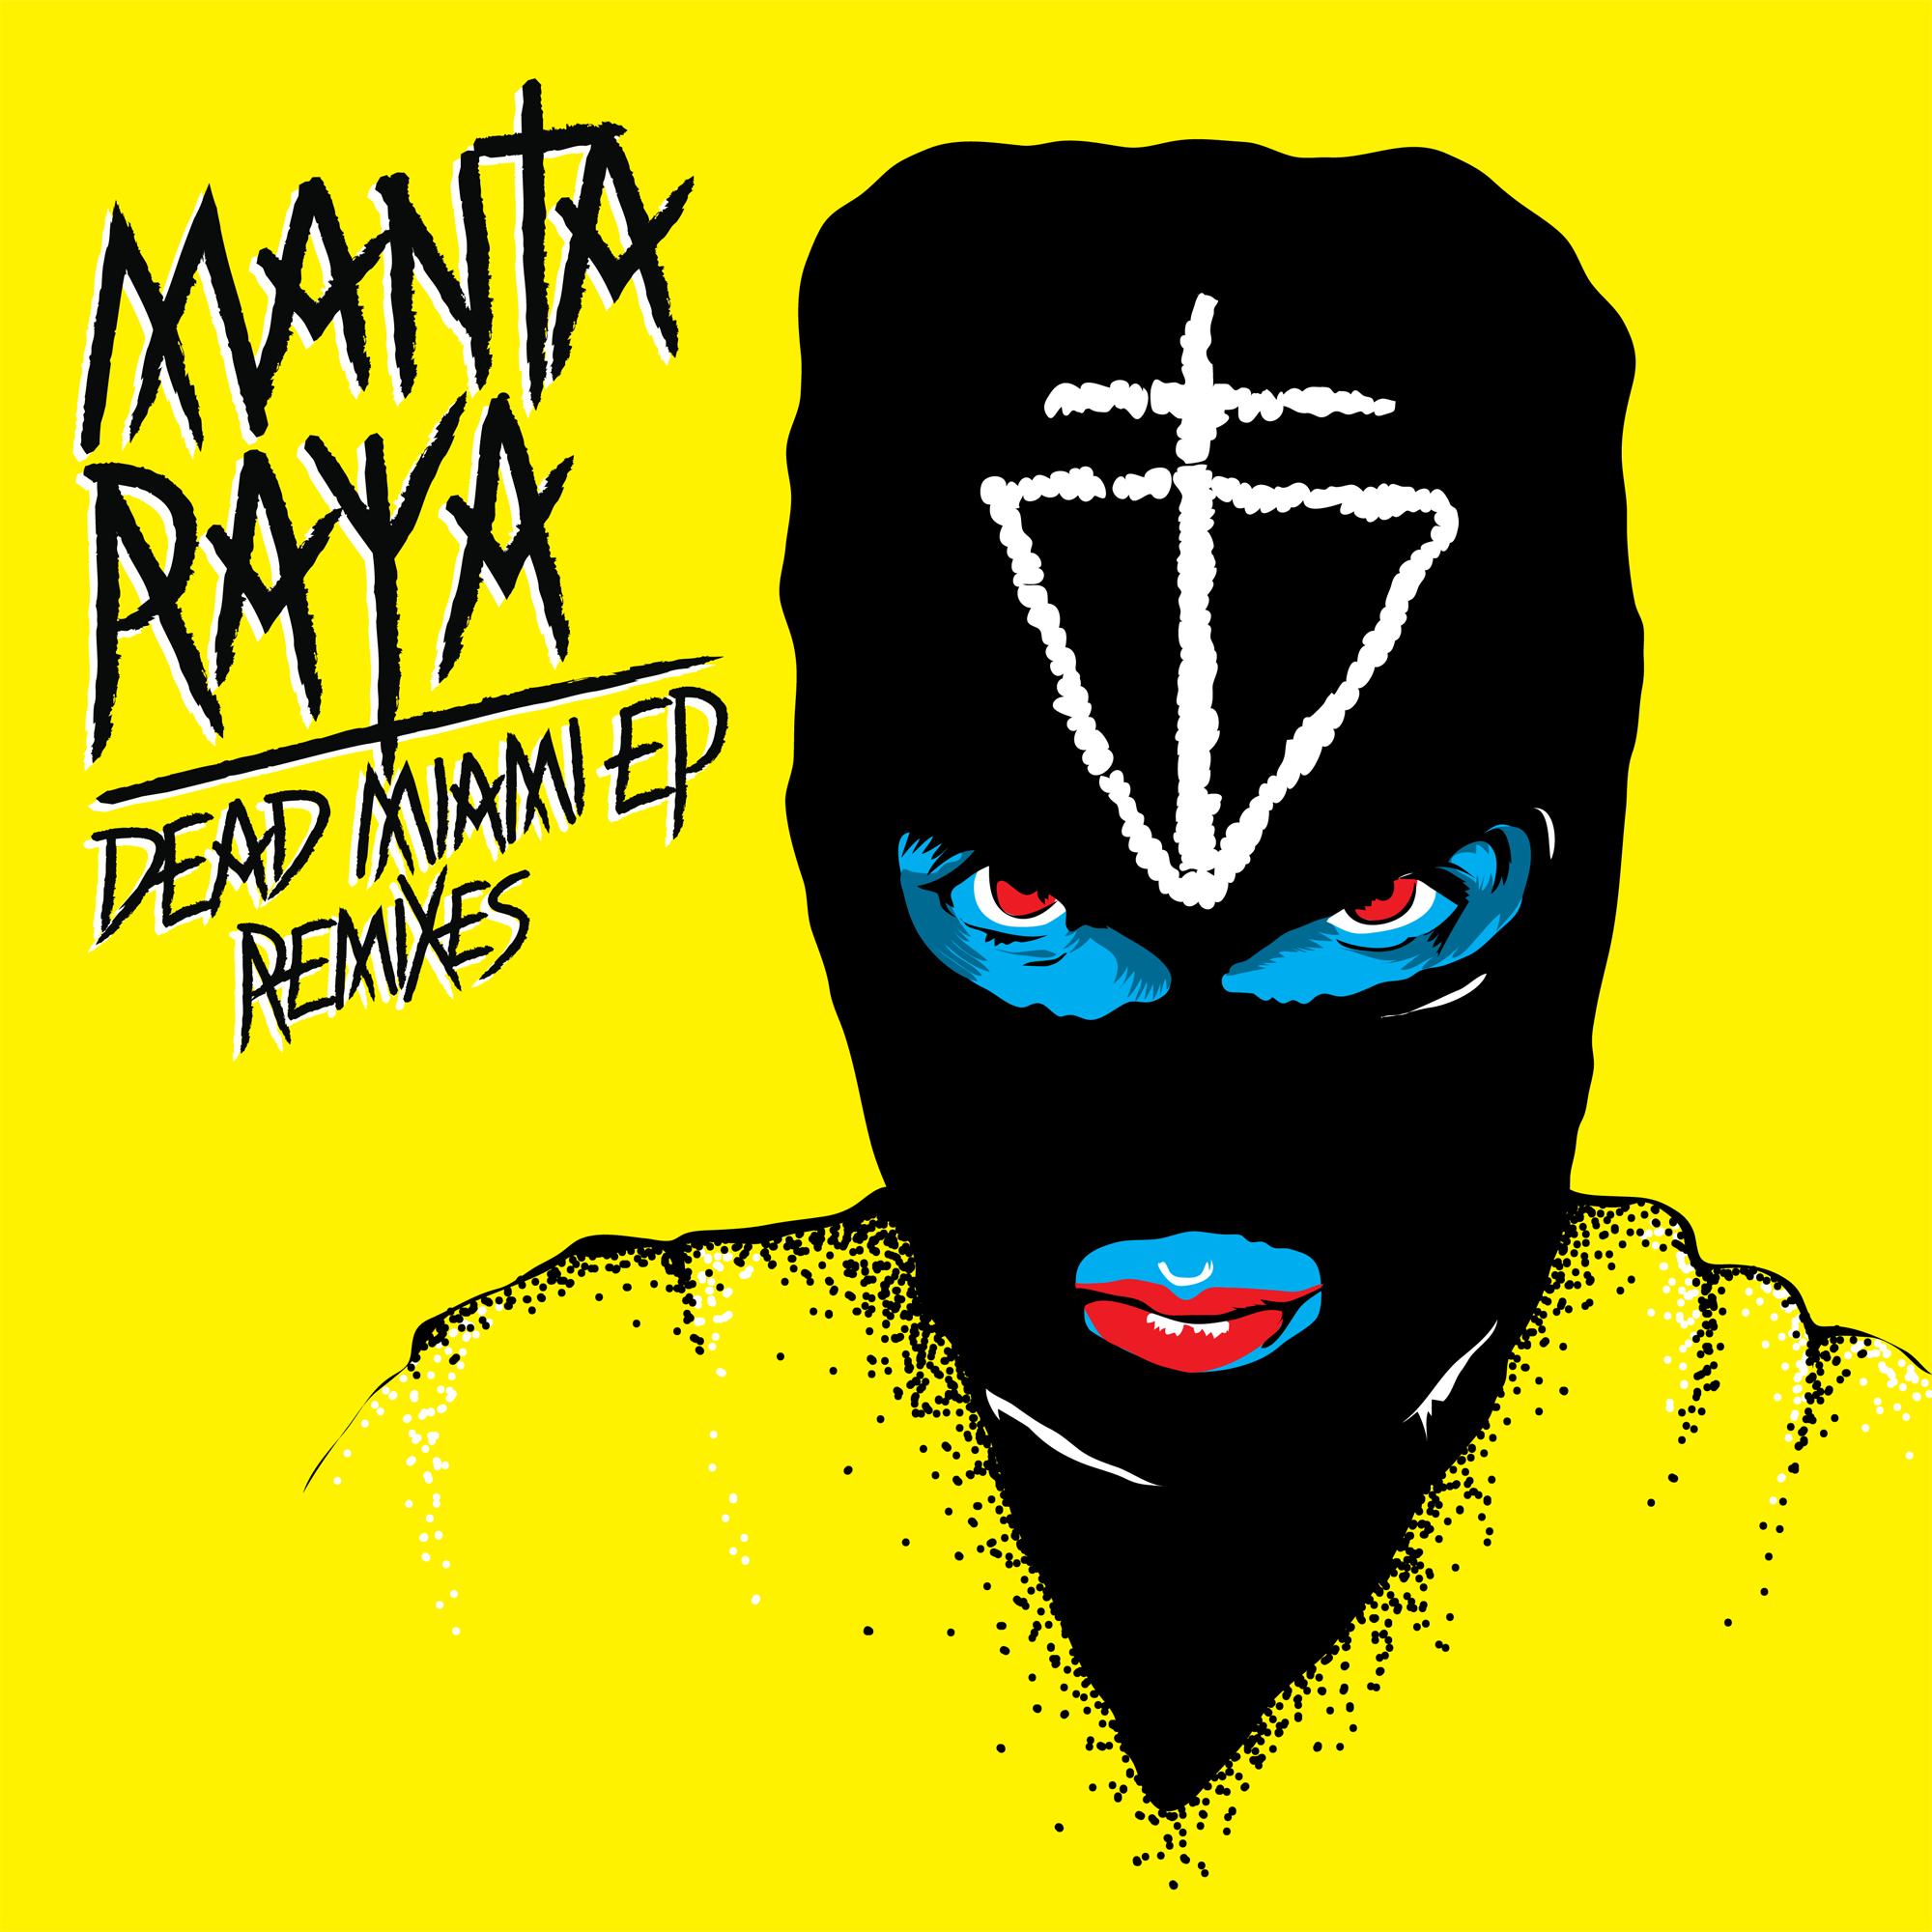 Manta Raya - Dead Miami EP (Remixes)